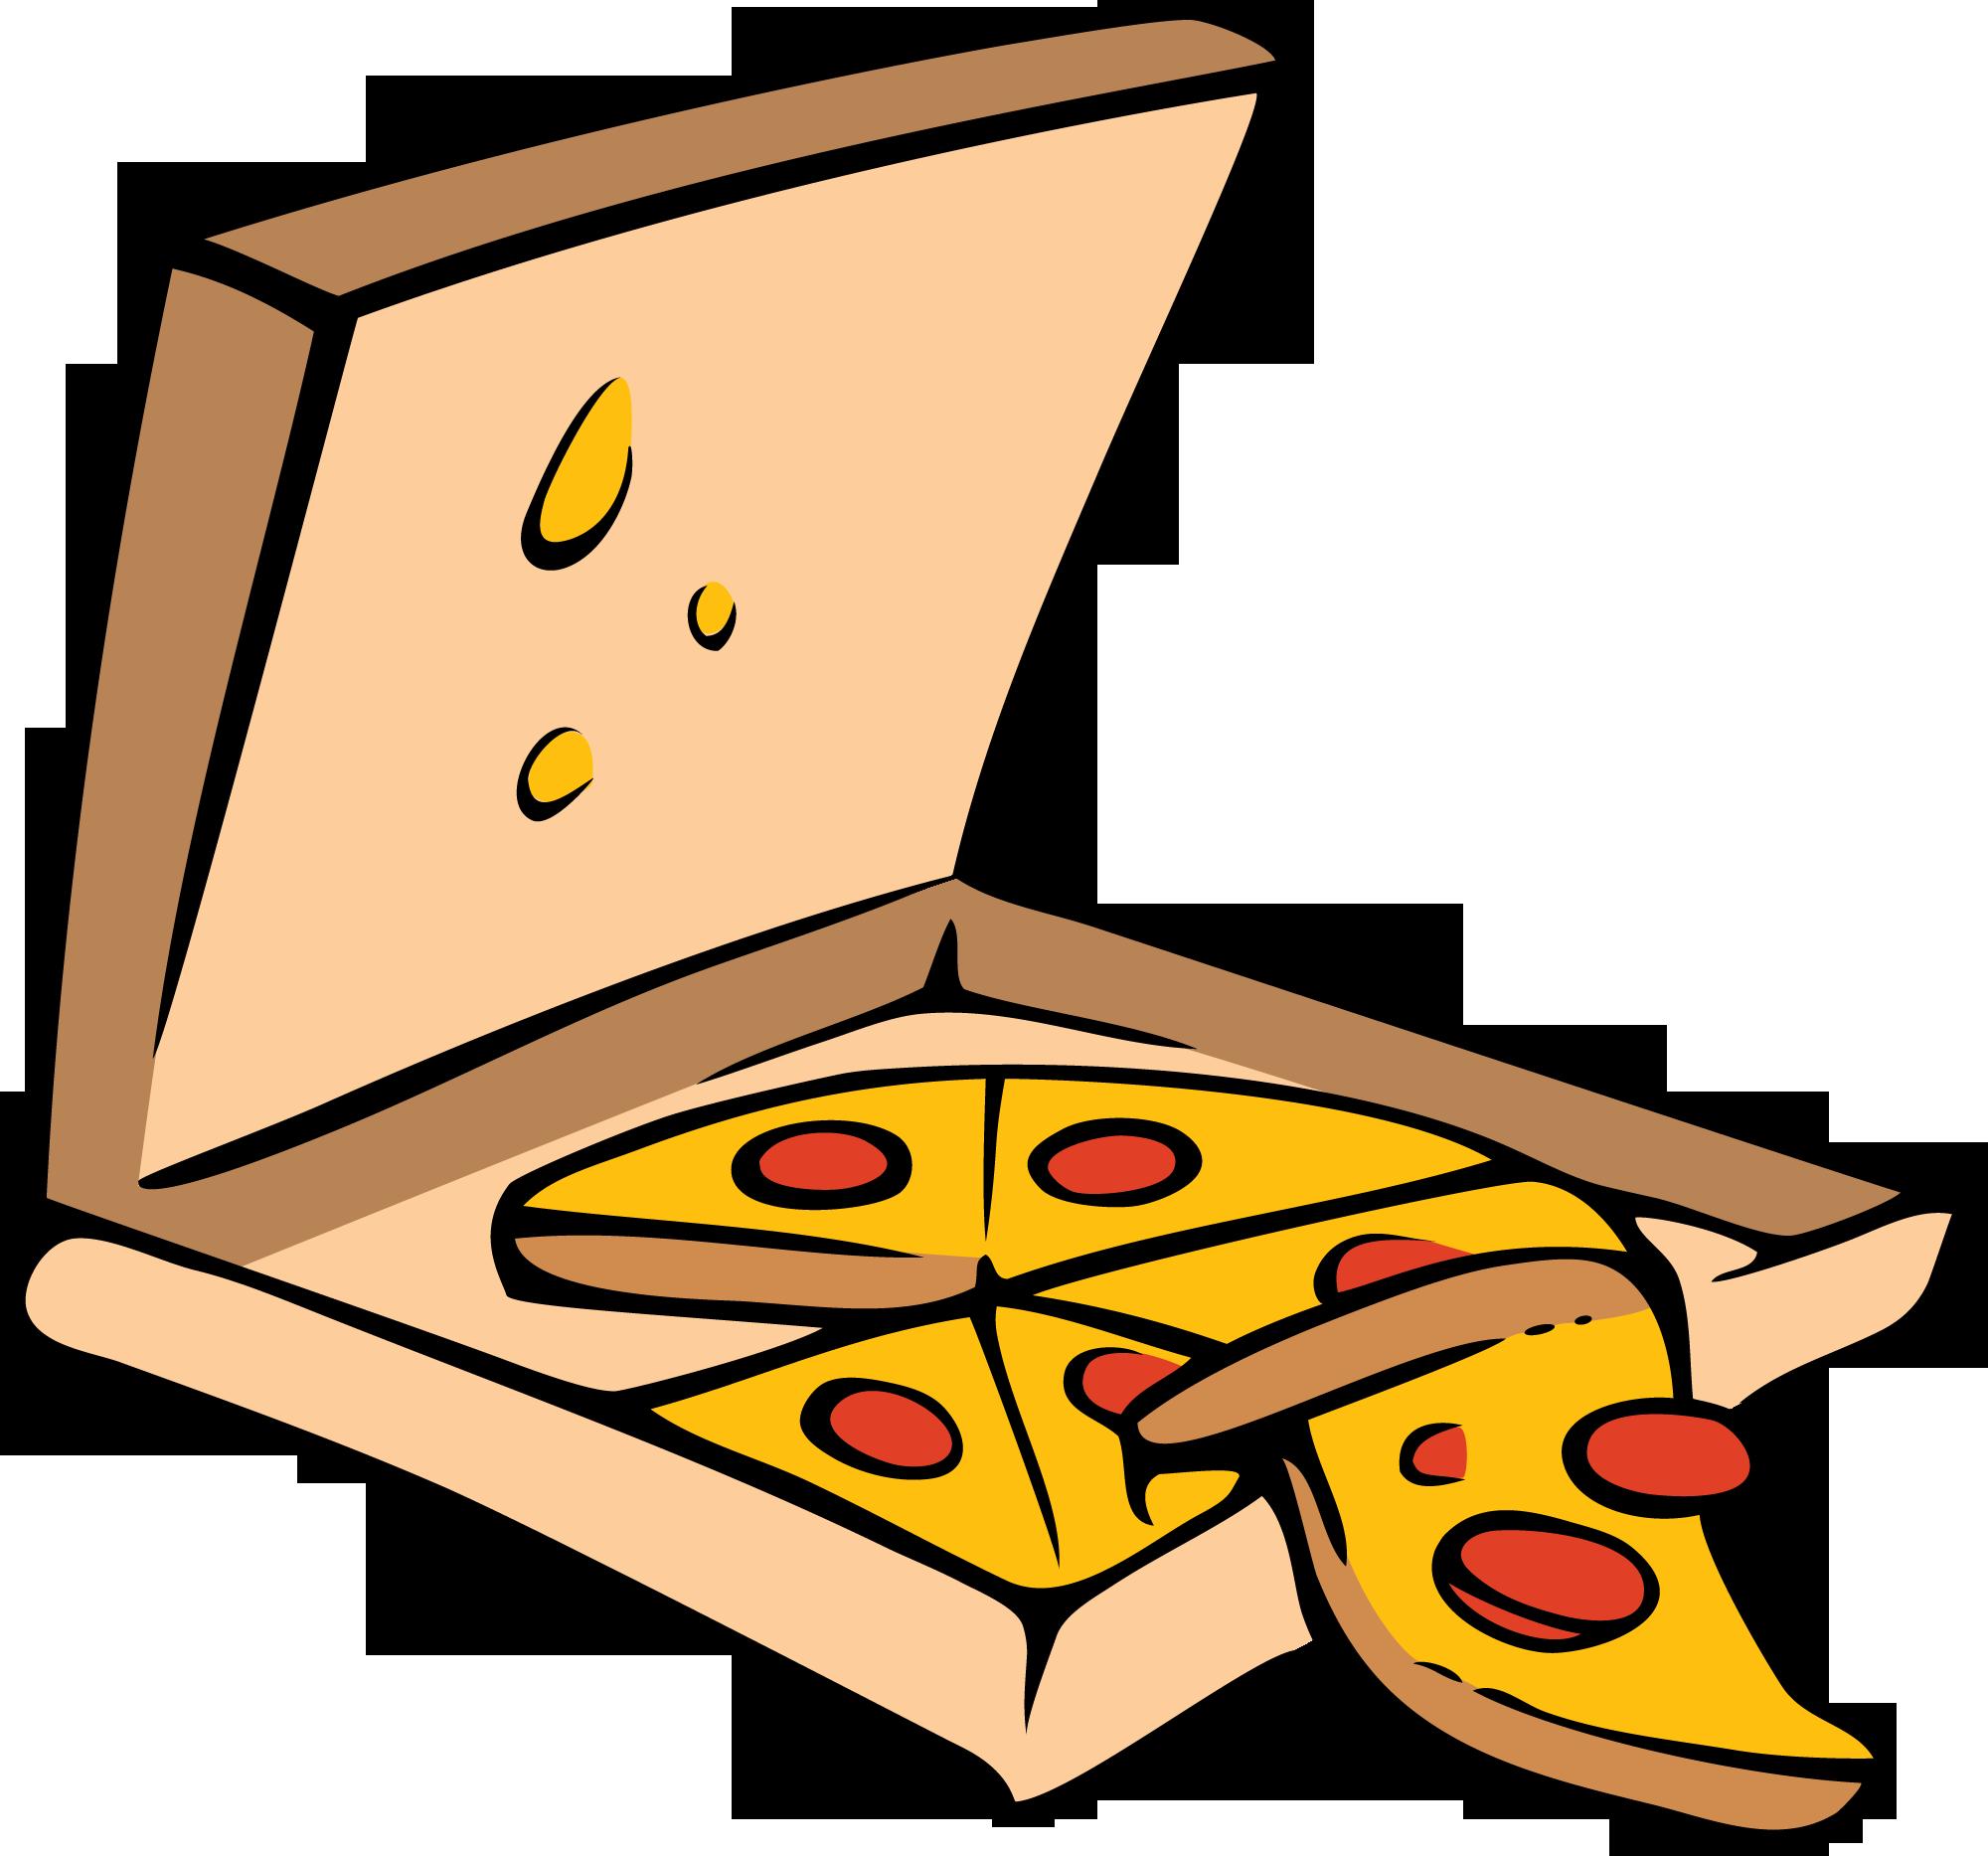 Pizza clipart yellow Clipart pizza%20cartoon Clipart Panda Images